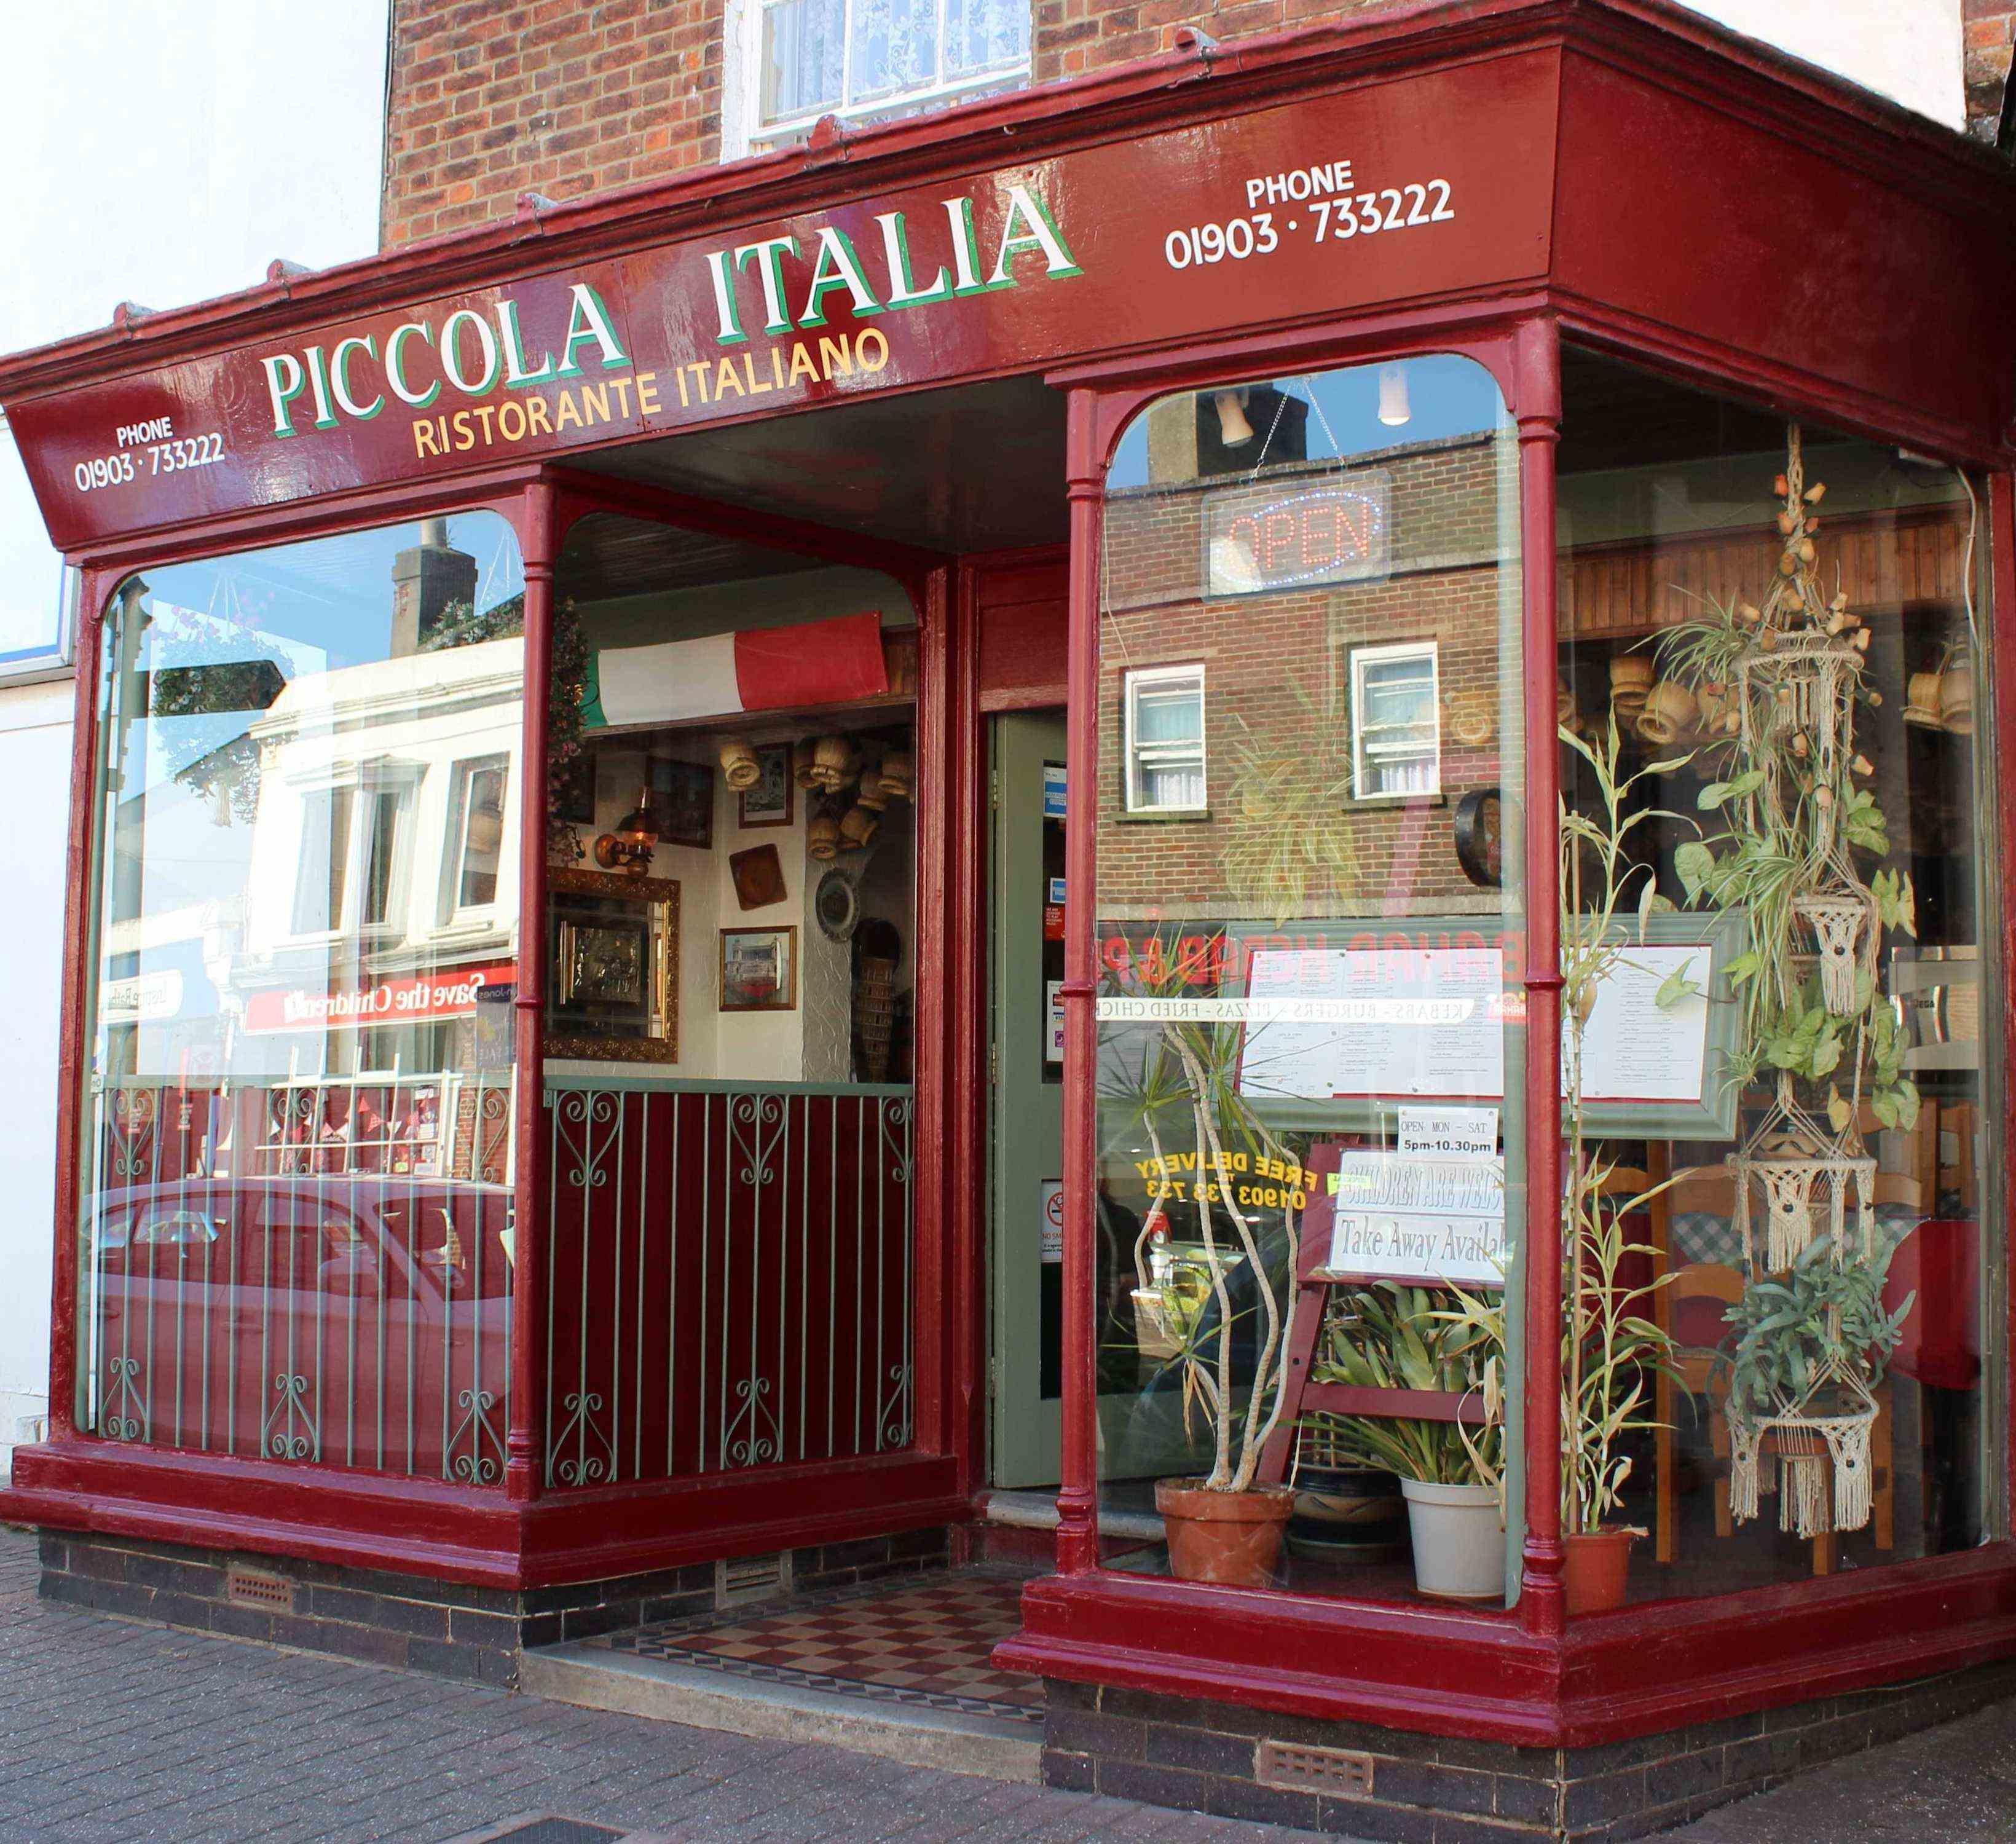 Italian Restaurant Outside - Italian restaurant in littlehampton west sussex the piccola italia restaurant a popular italian restaurant in littlehampton west sussex